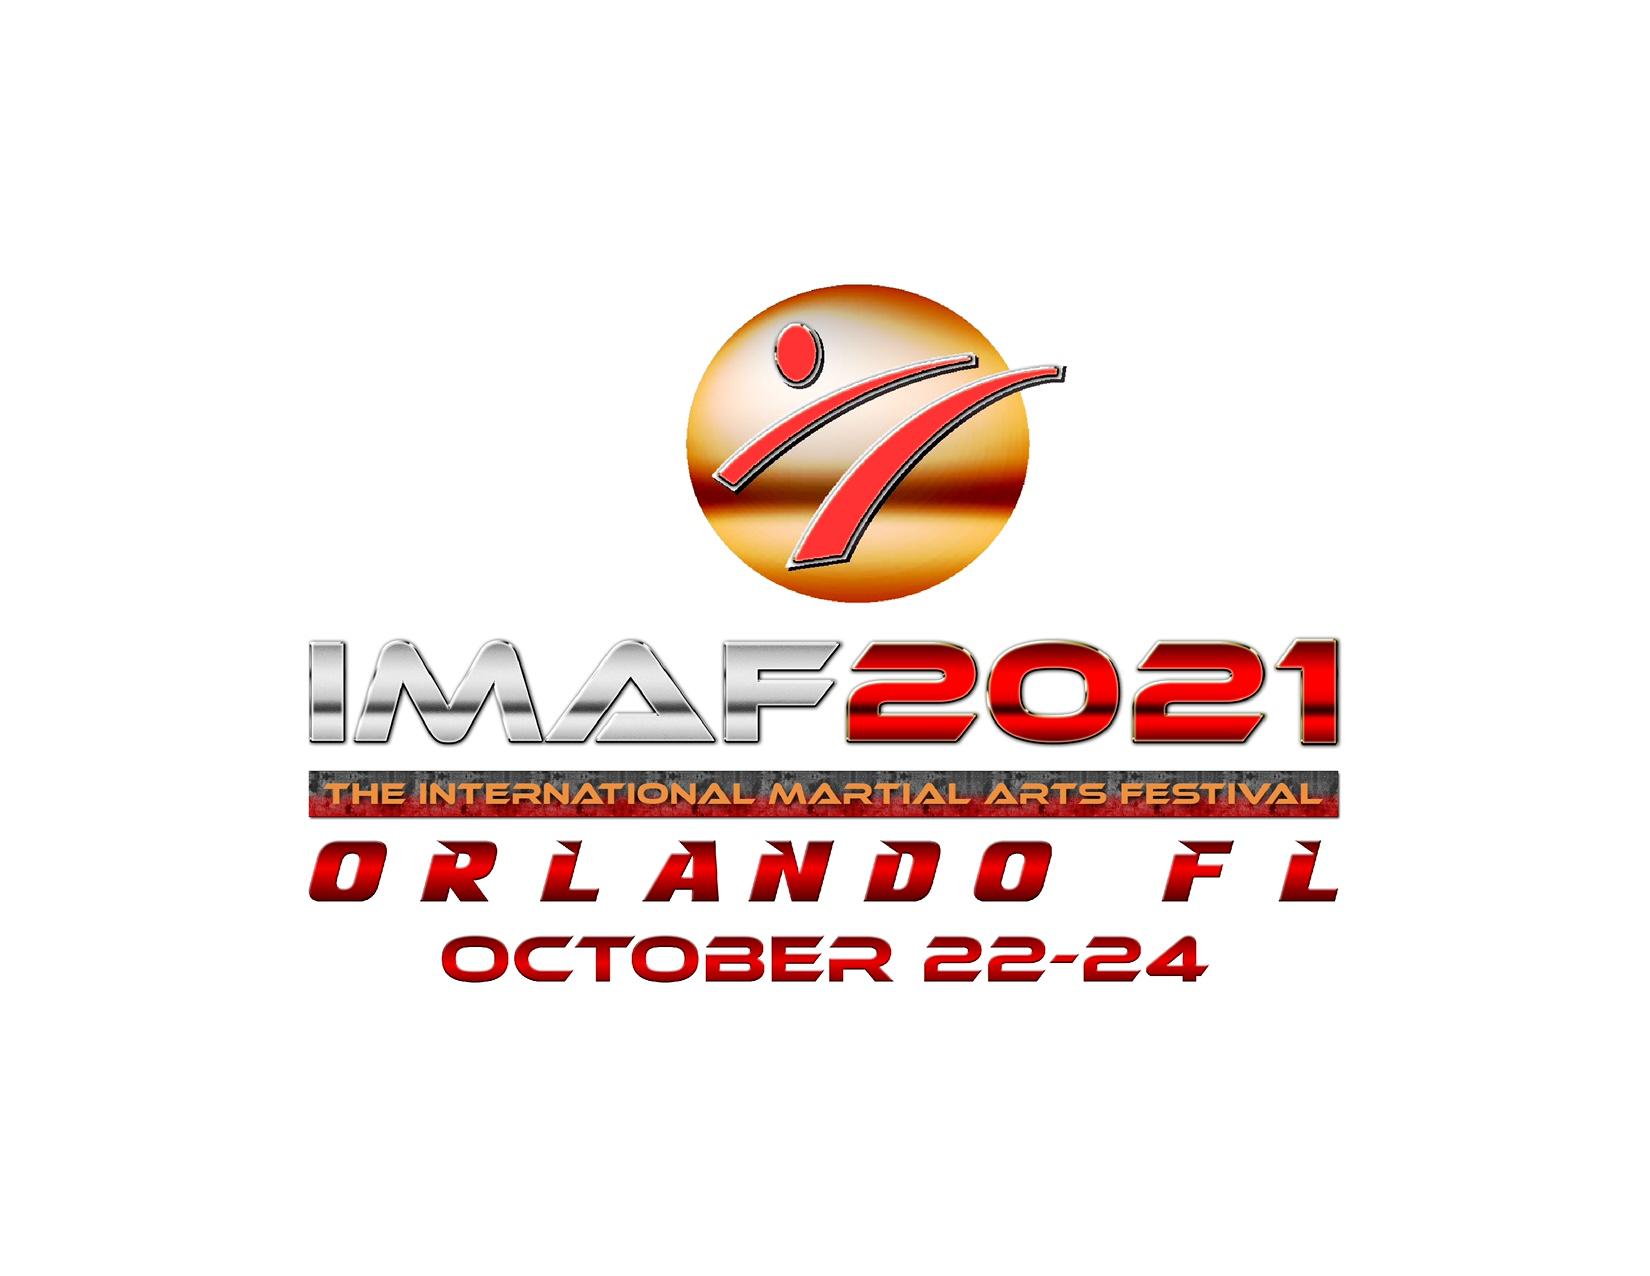 IMAF - International Martial Arts Festival